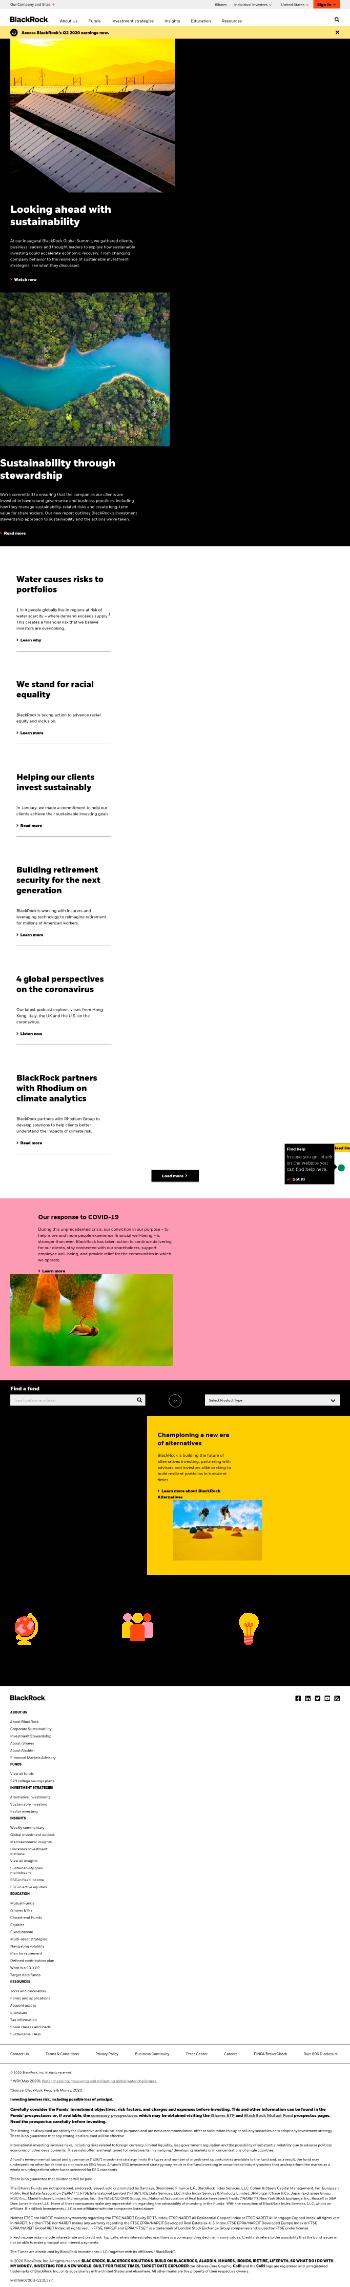 BlackRock MuniEnhanced Fund, Inc. Website Screenshot